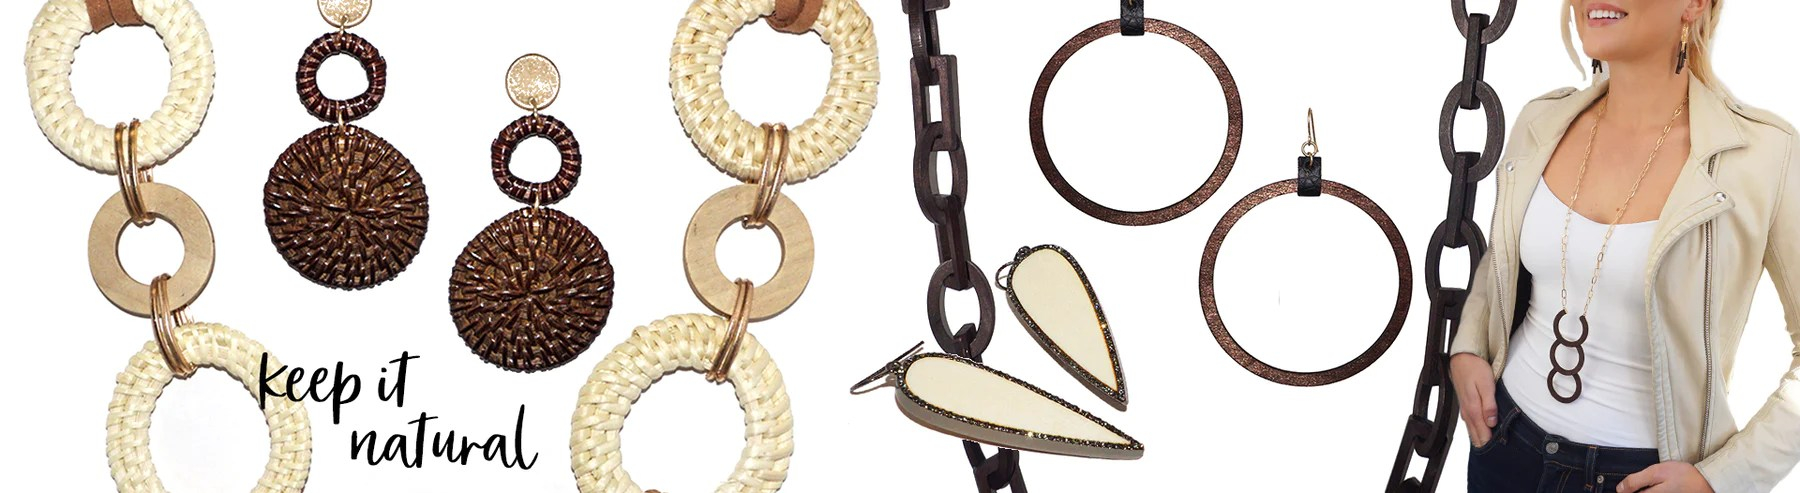 Wholesale Jewelry Near Me